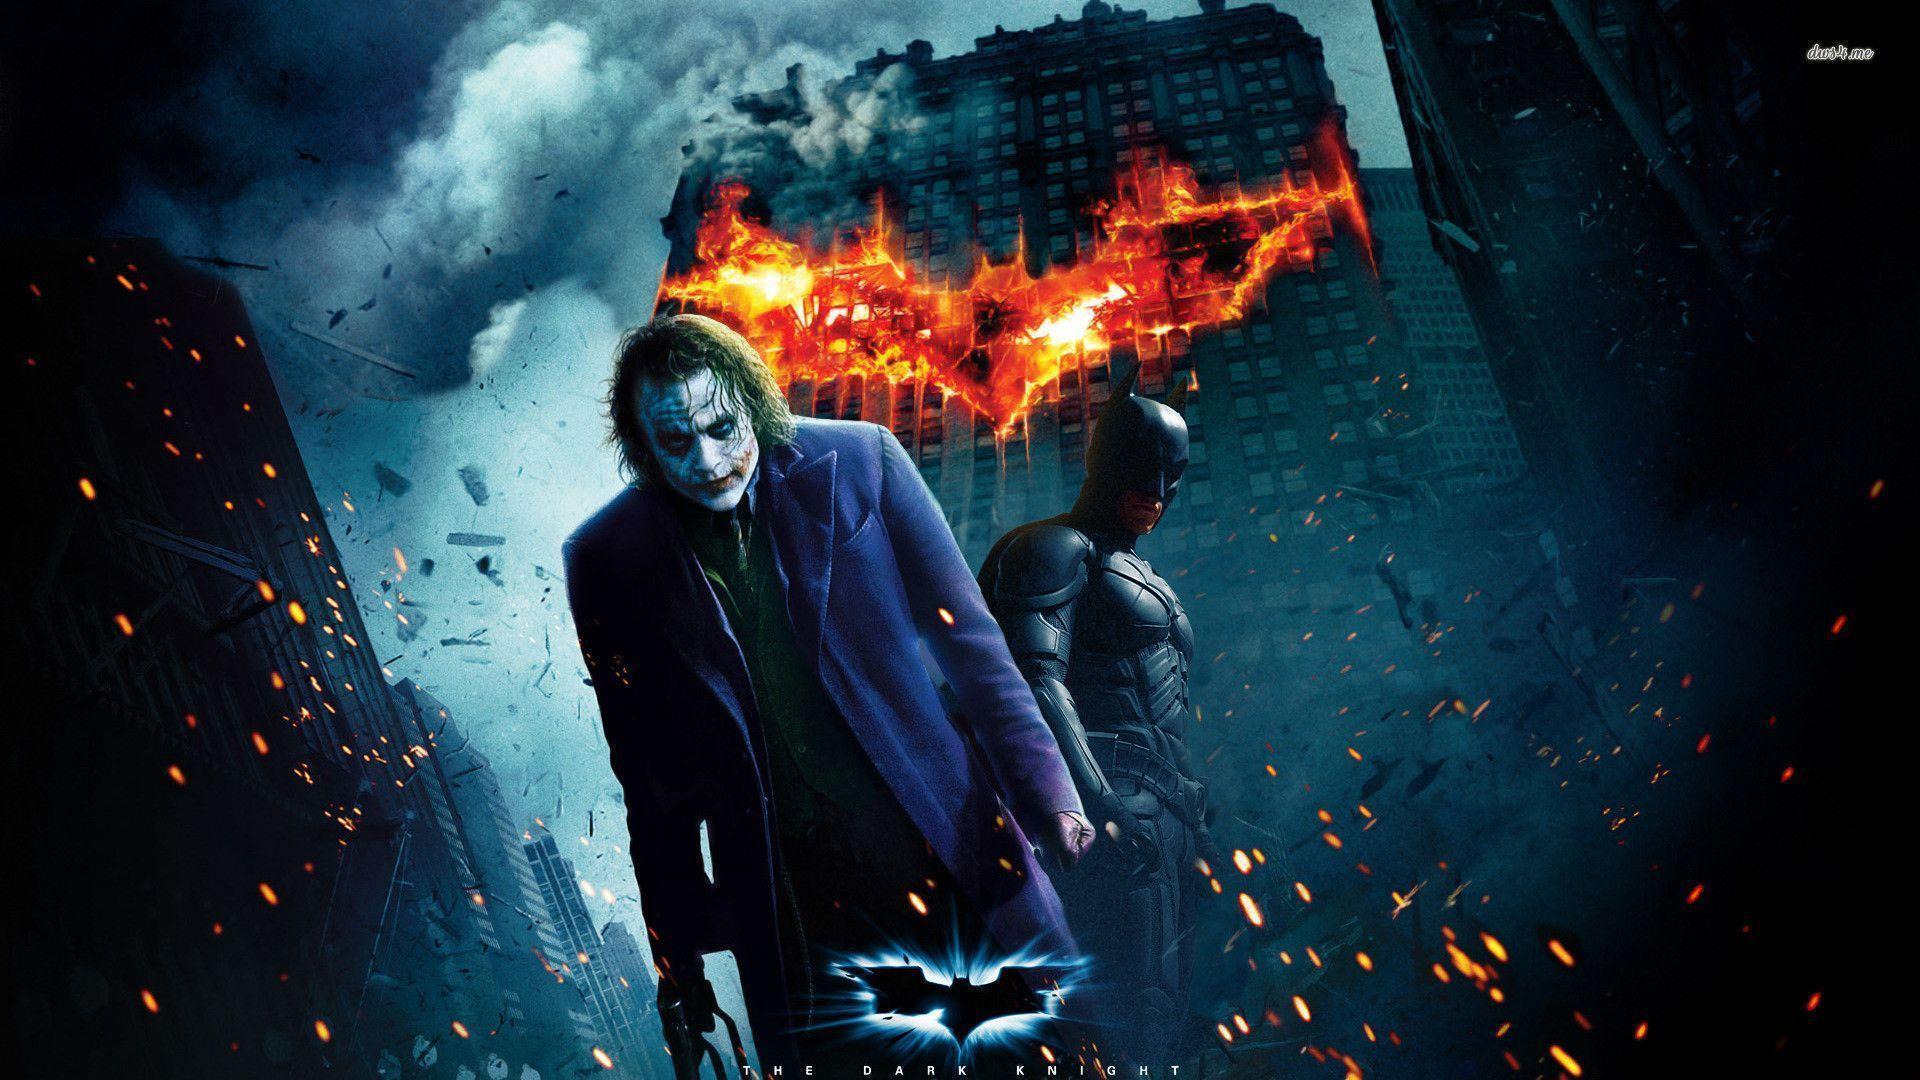 Joker - Batman - Movie - Joke - Biohazard - Batman Movie Joker ...